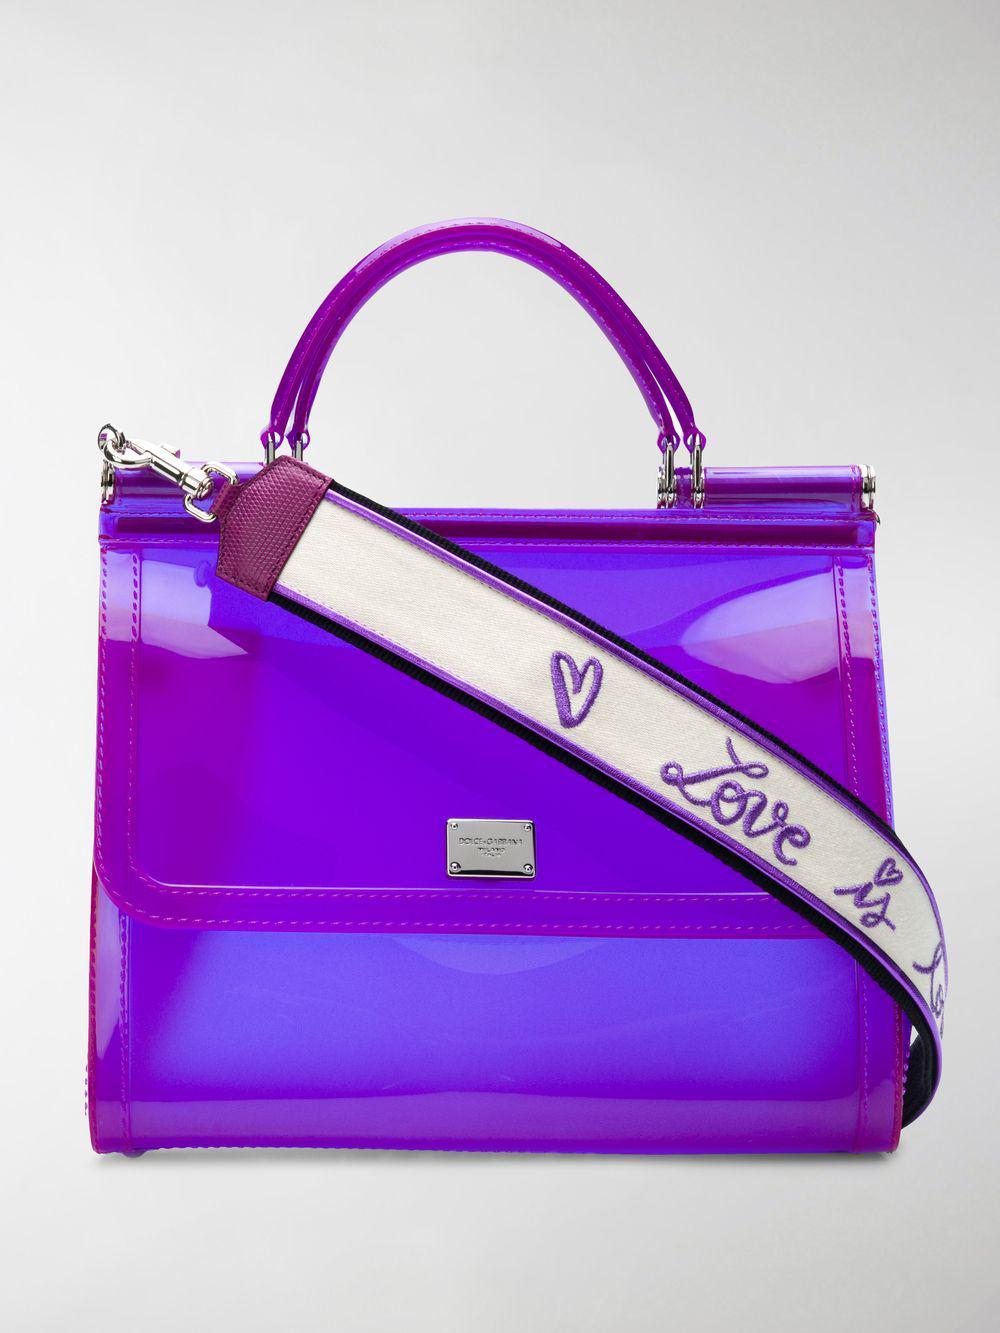 7b9ccd0ea6 Lyst - Dolce   Gabbana Large Sicily Bag in Purple